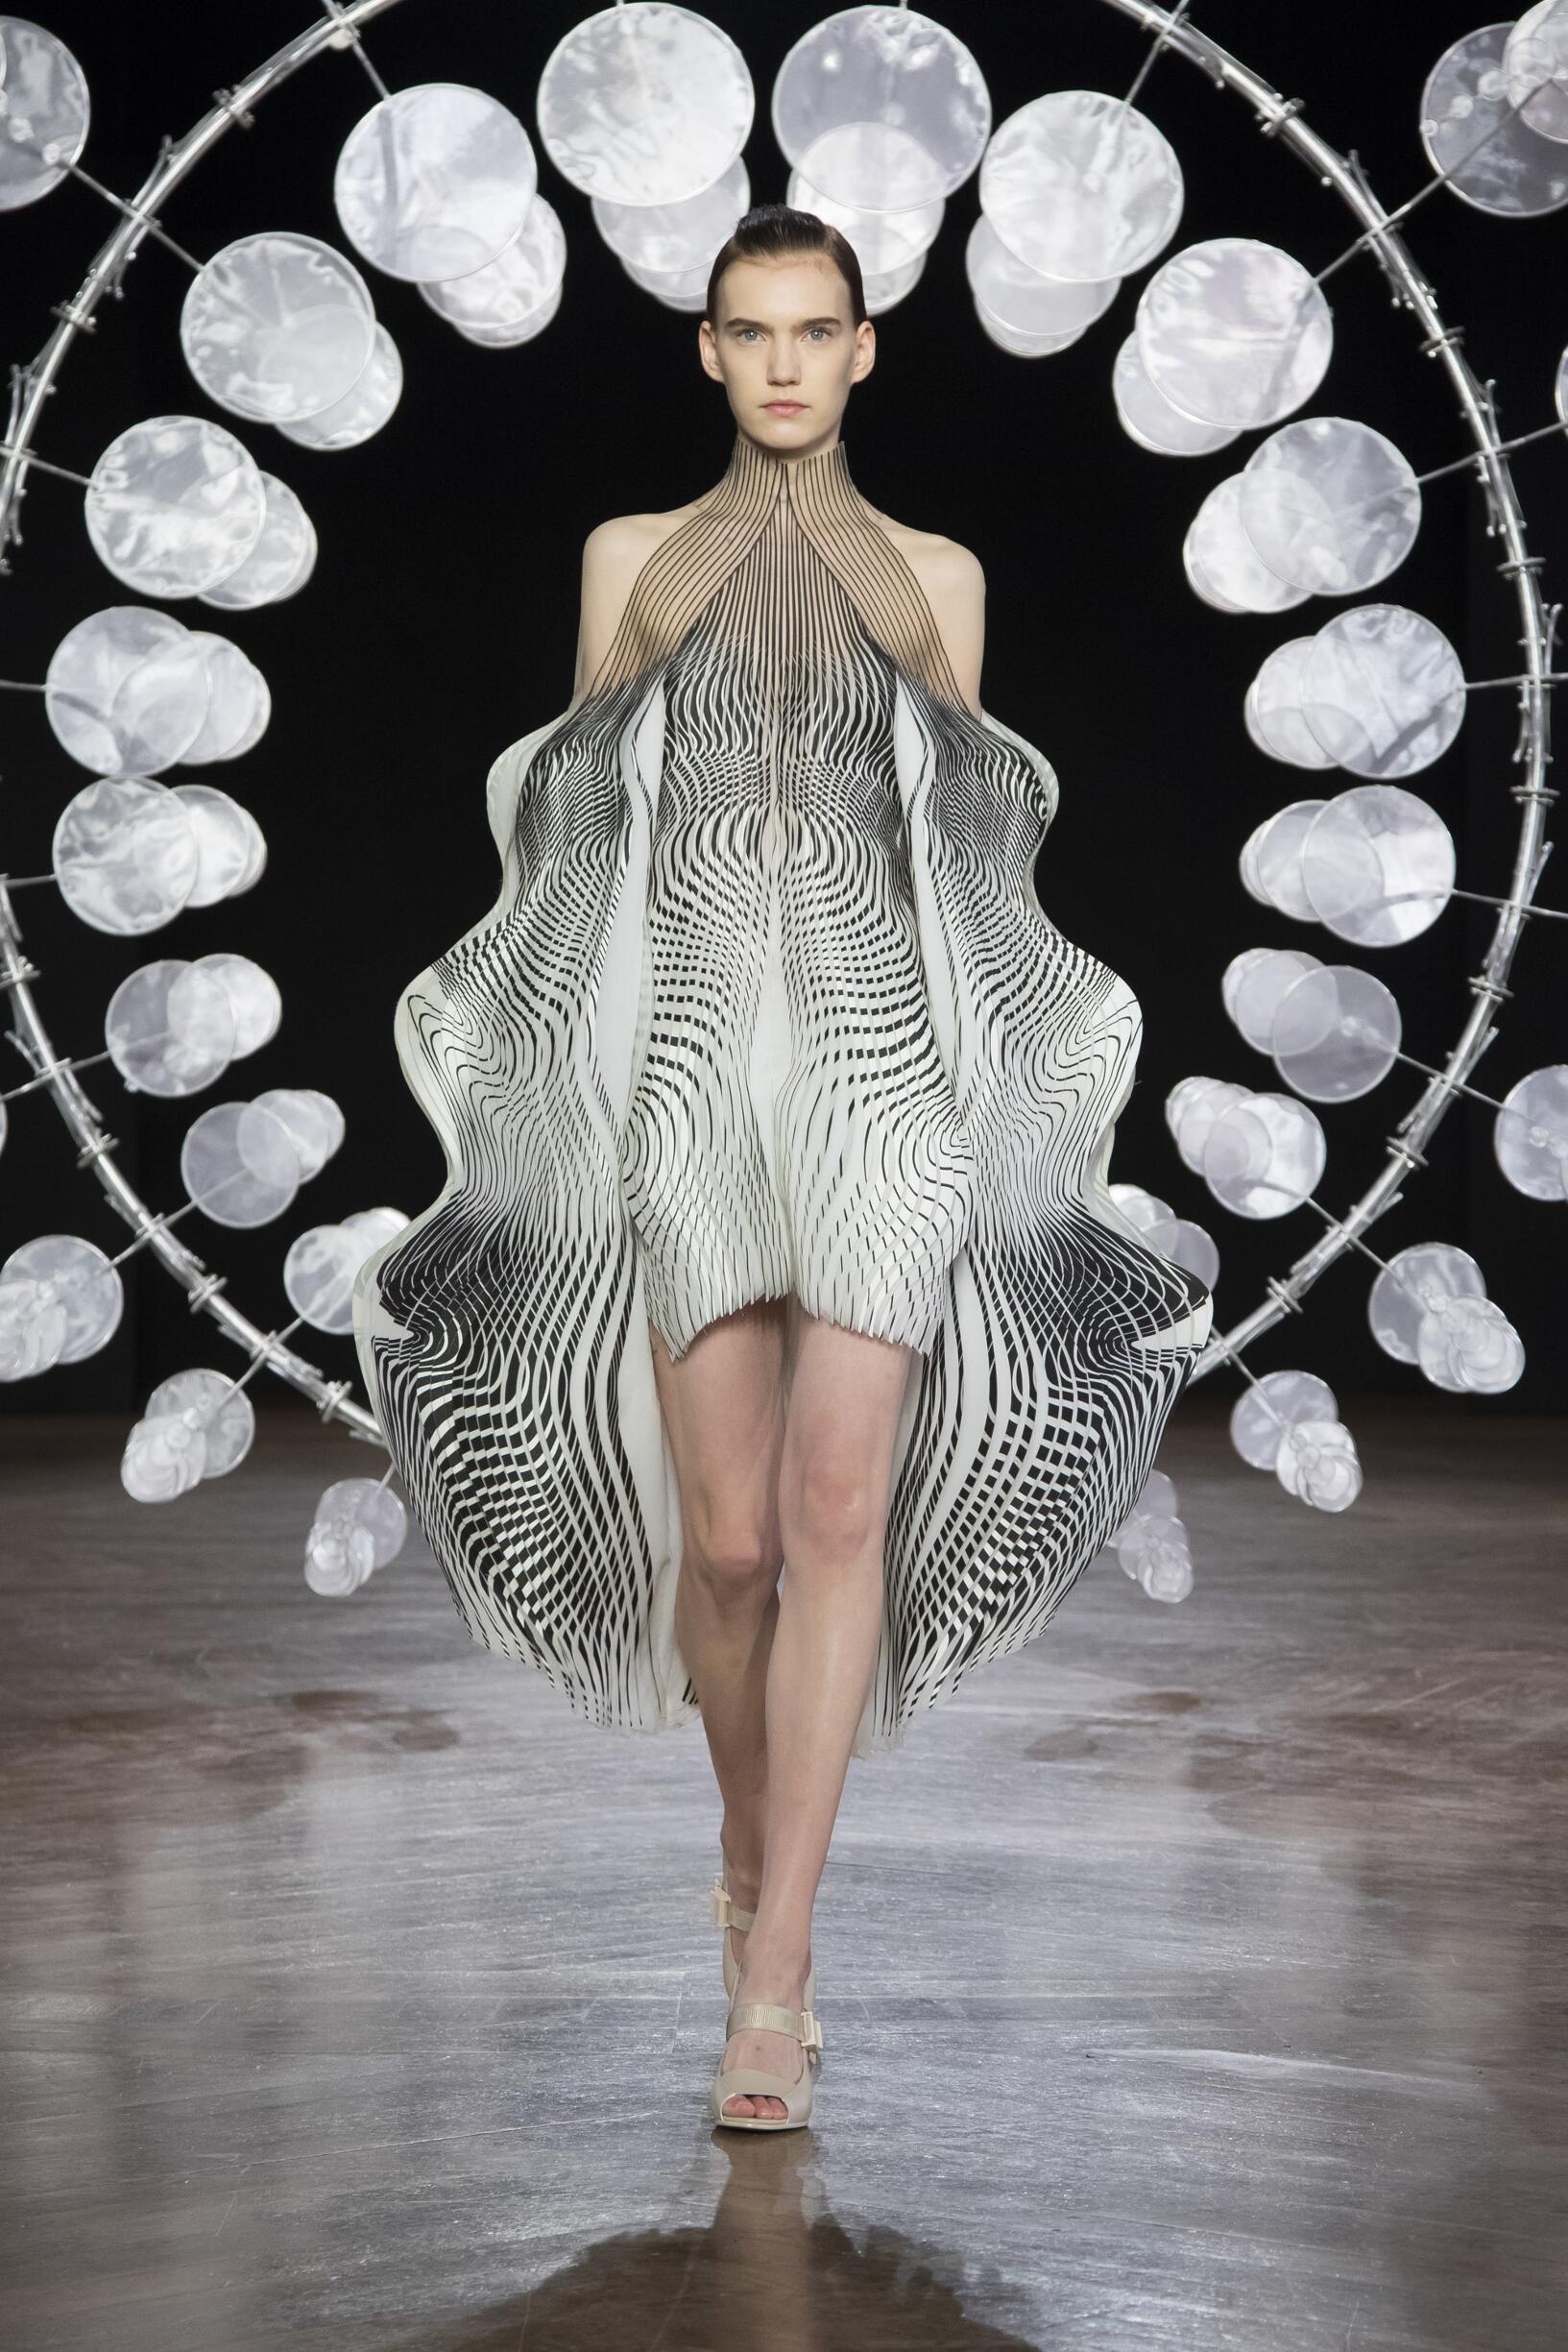 Model Fashion Show Iris van Herpen Haute Couture